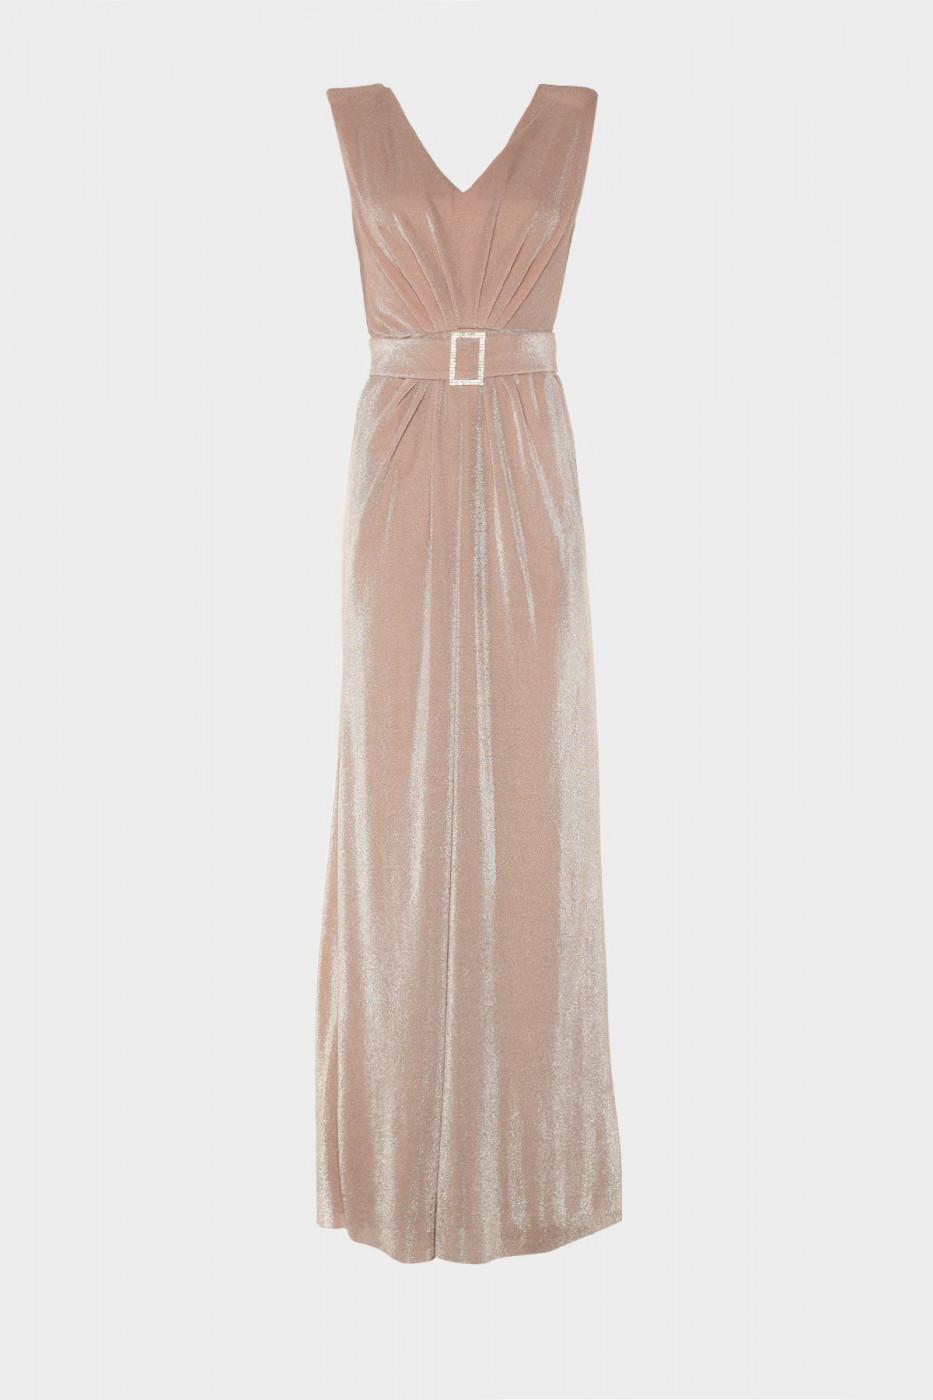 Trendyol Powder Belt Detailed Evening Dress & Graduation Dress